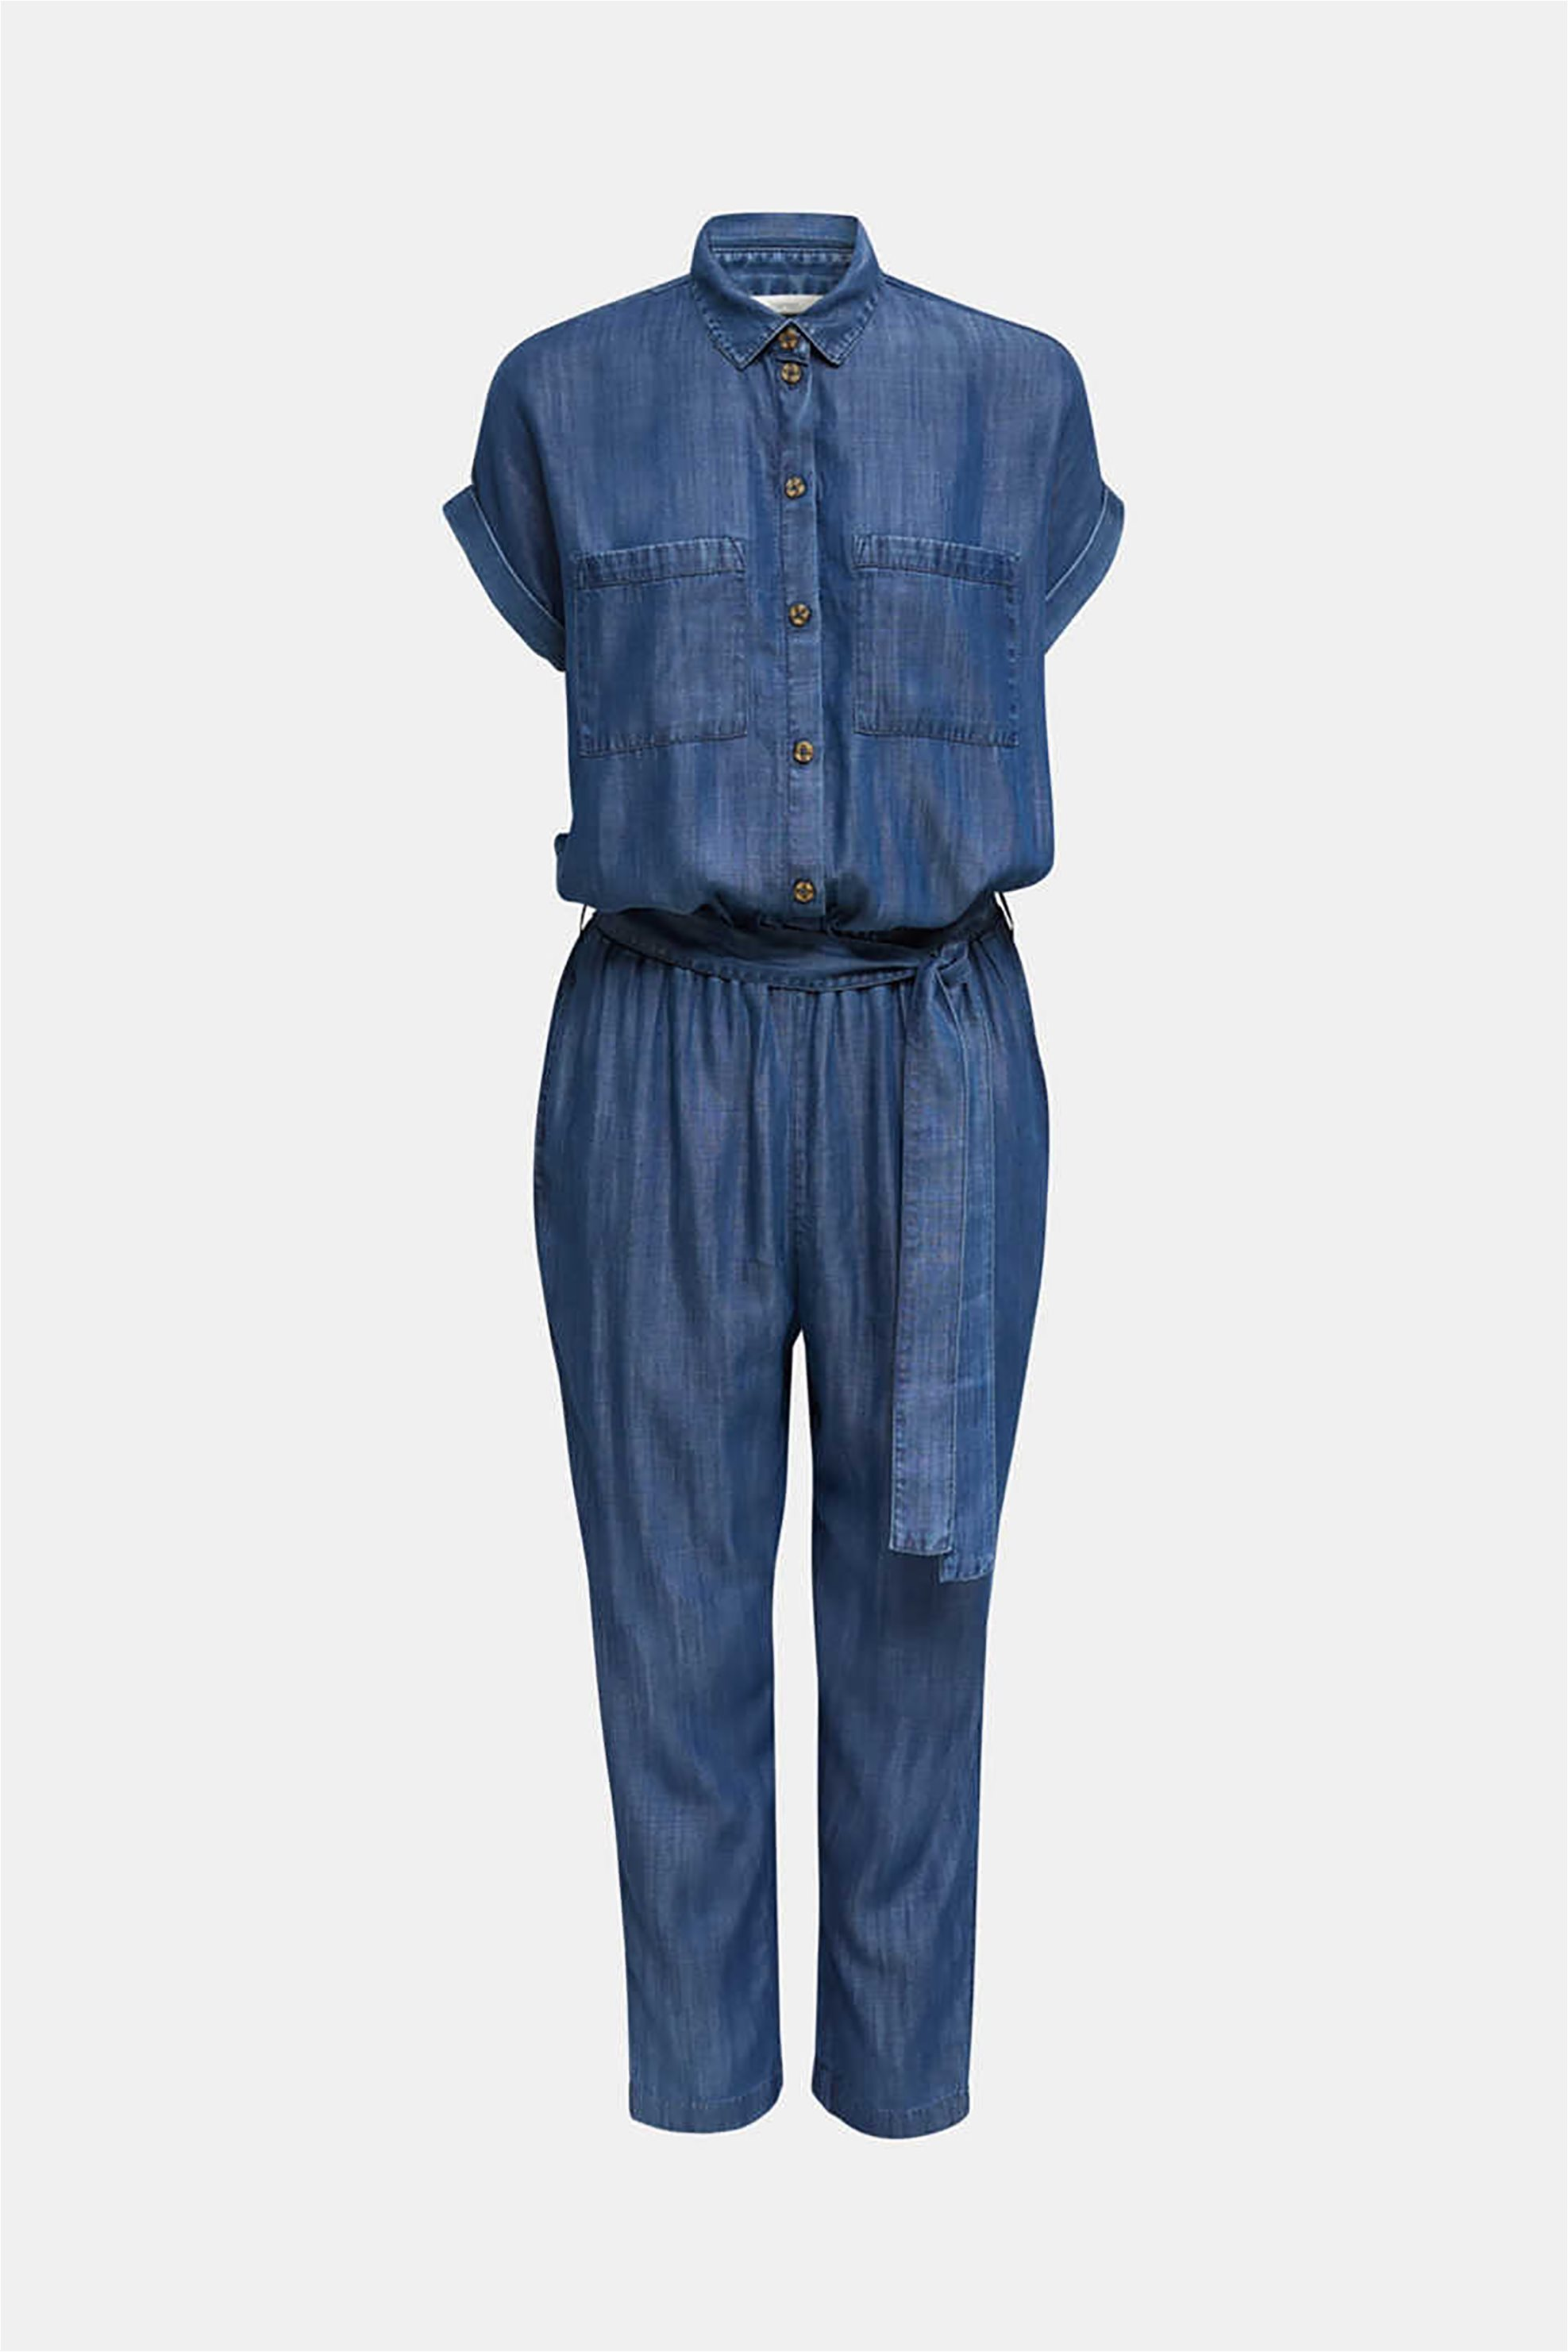 Esprit γυναικεία φόρμα denim ολόσωμη με ζωνάκι από το ίδιο ύφασμα - 040EE1L303 - Μπλε Σκούρο